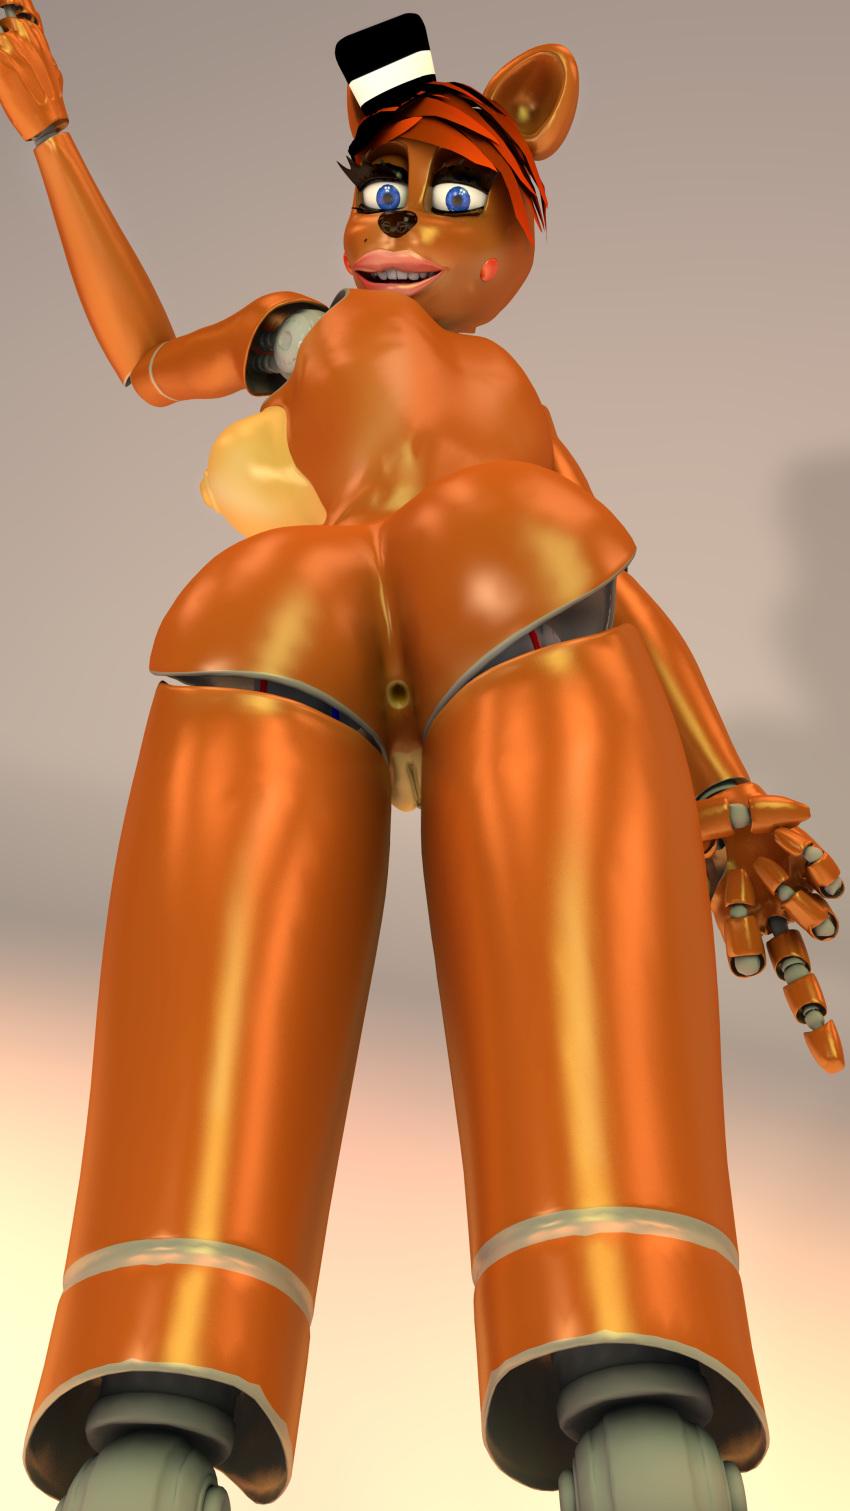 chica freddy x toy toy Dragon ball z animated gifs